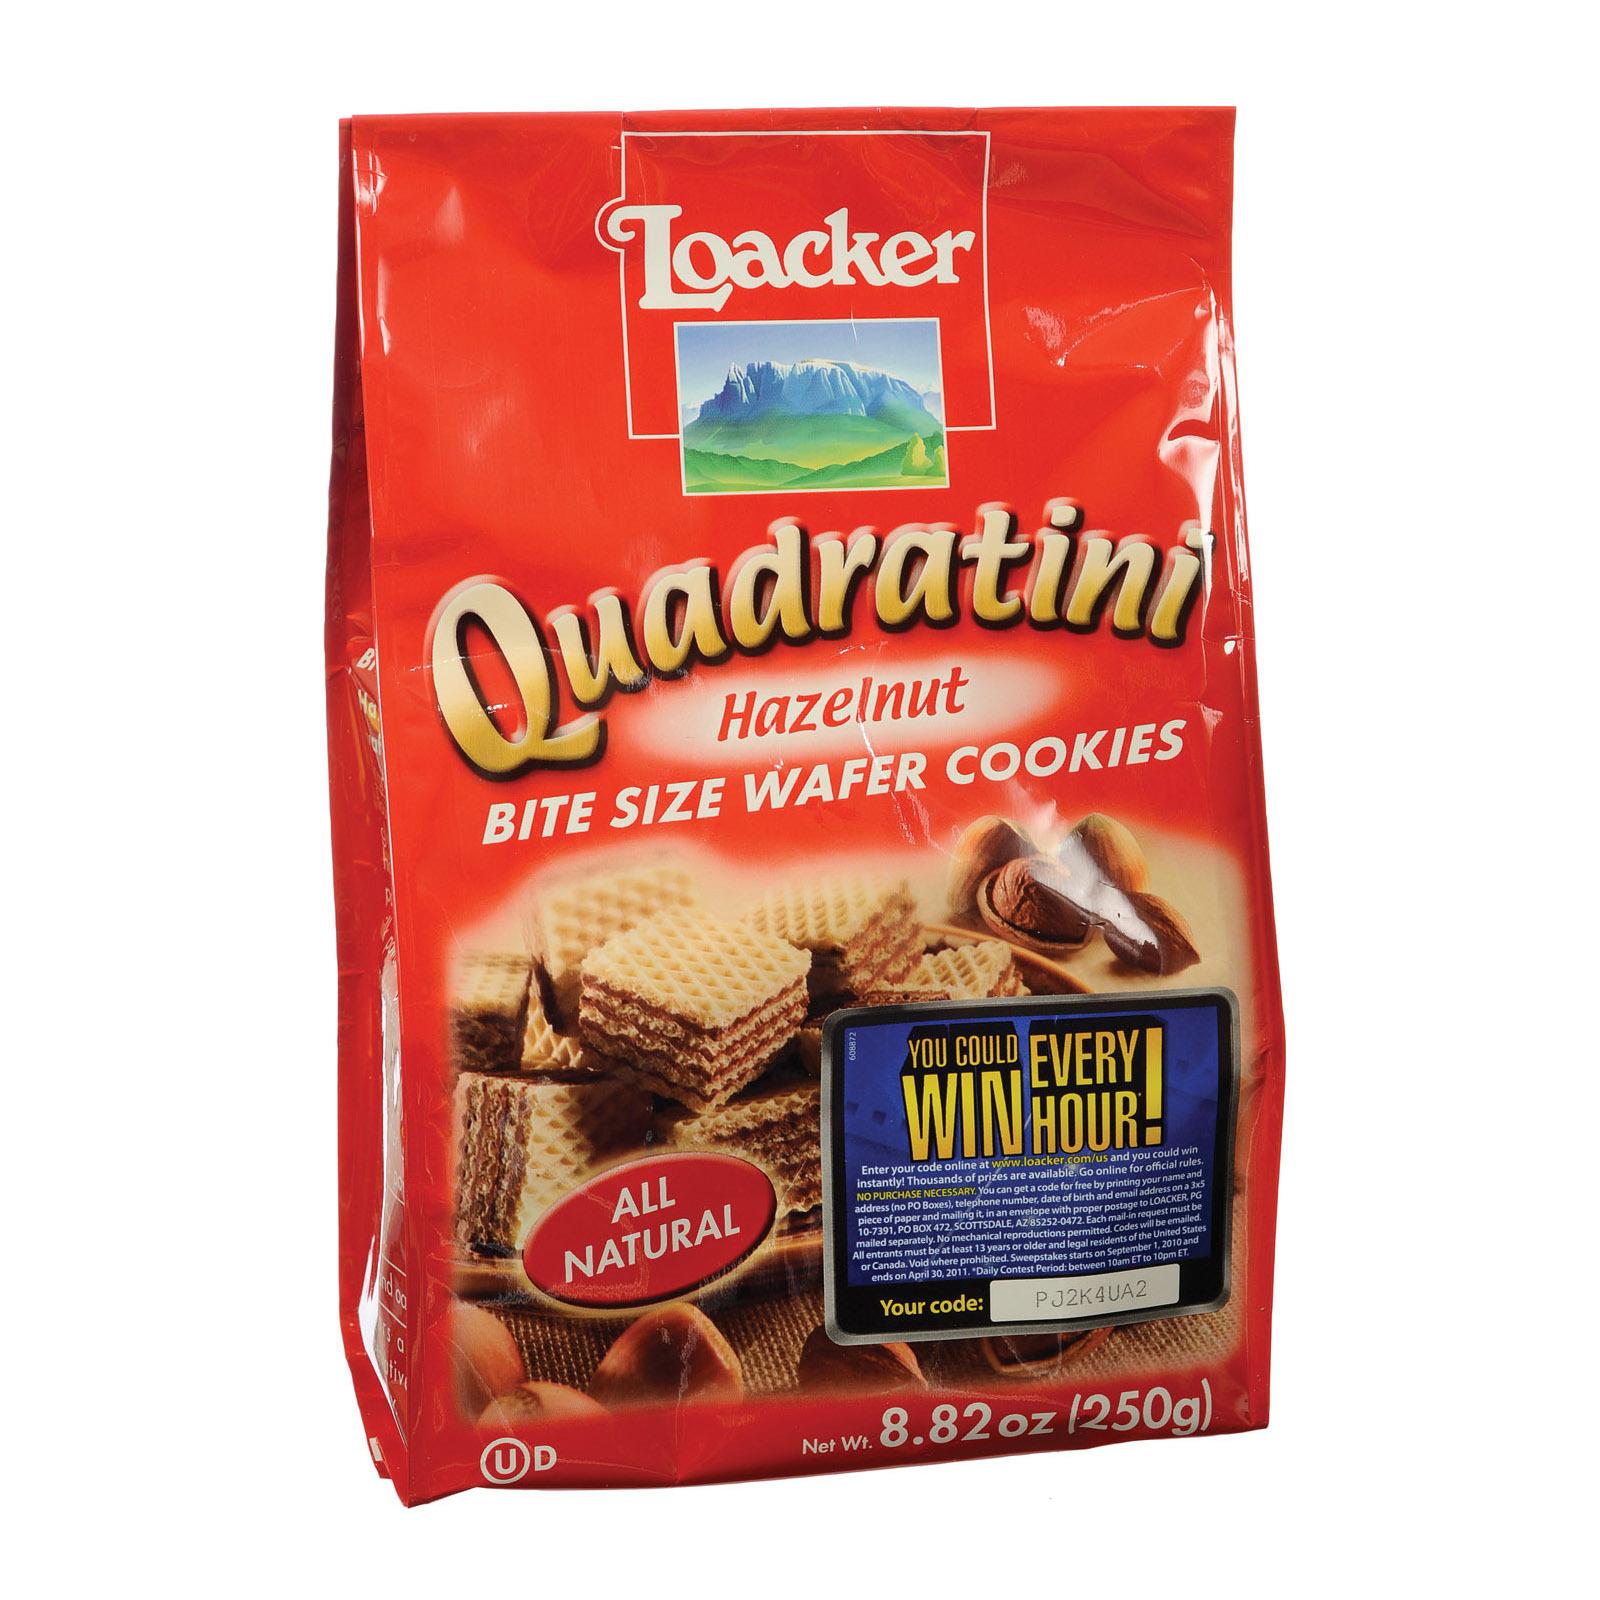 Loacker Quadratini Bite Size Wafer Cookies - Hazelnut - Case of 8 - 8.82 oz.